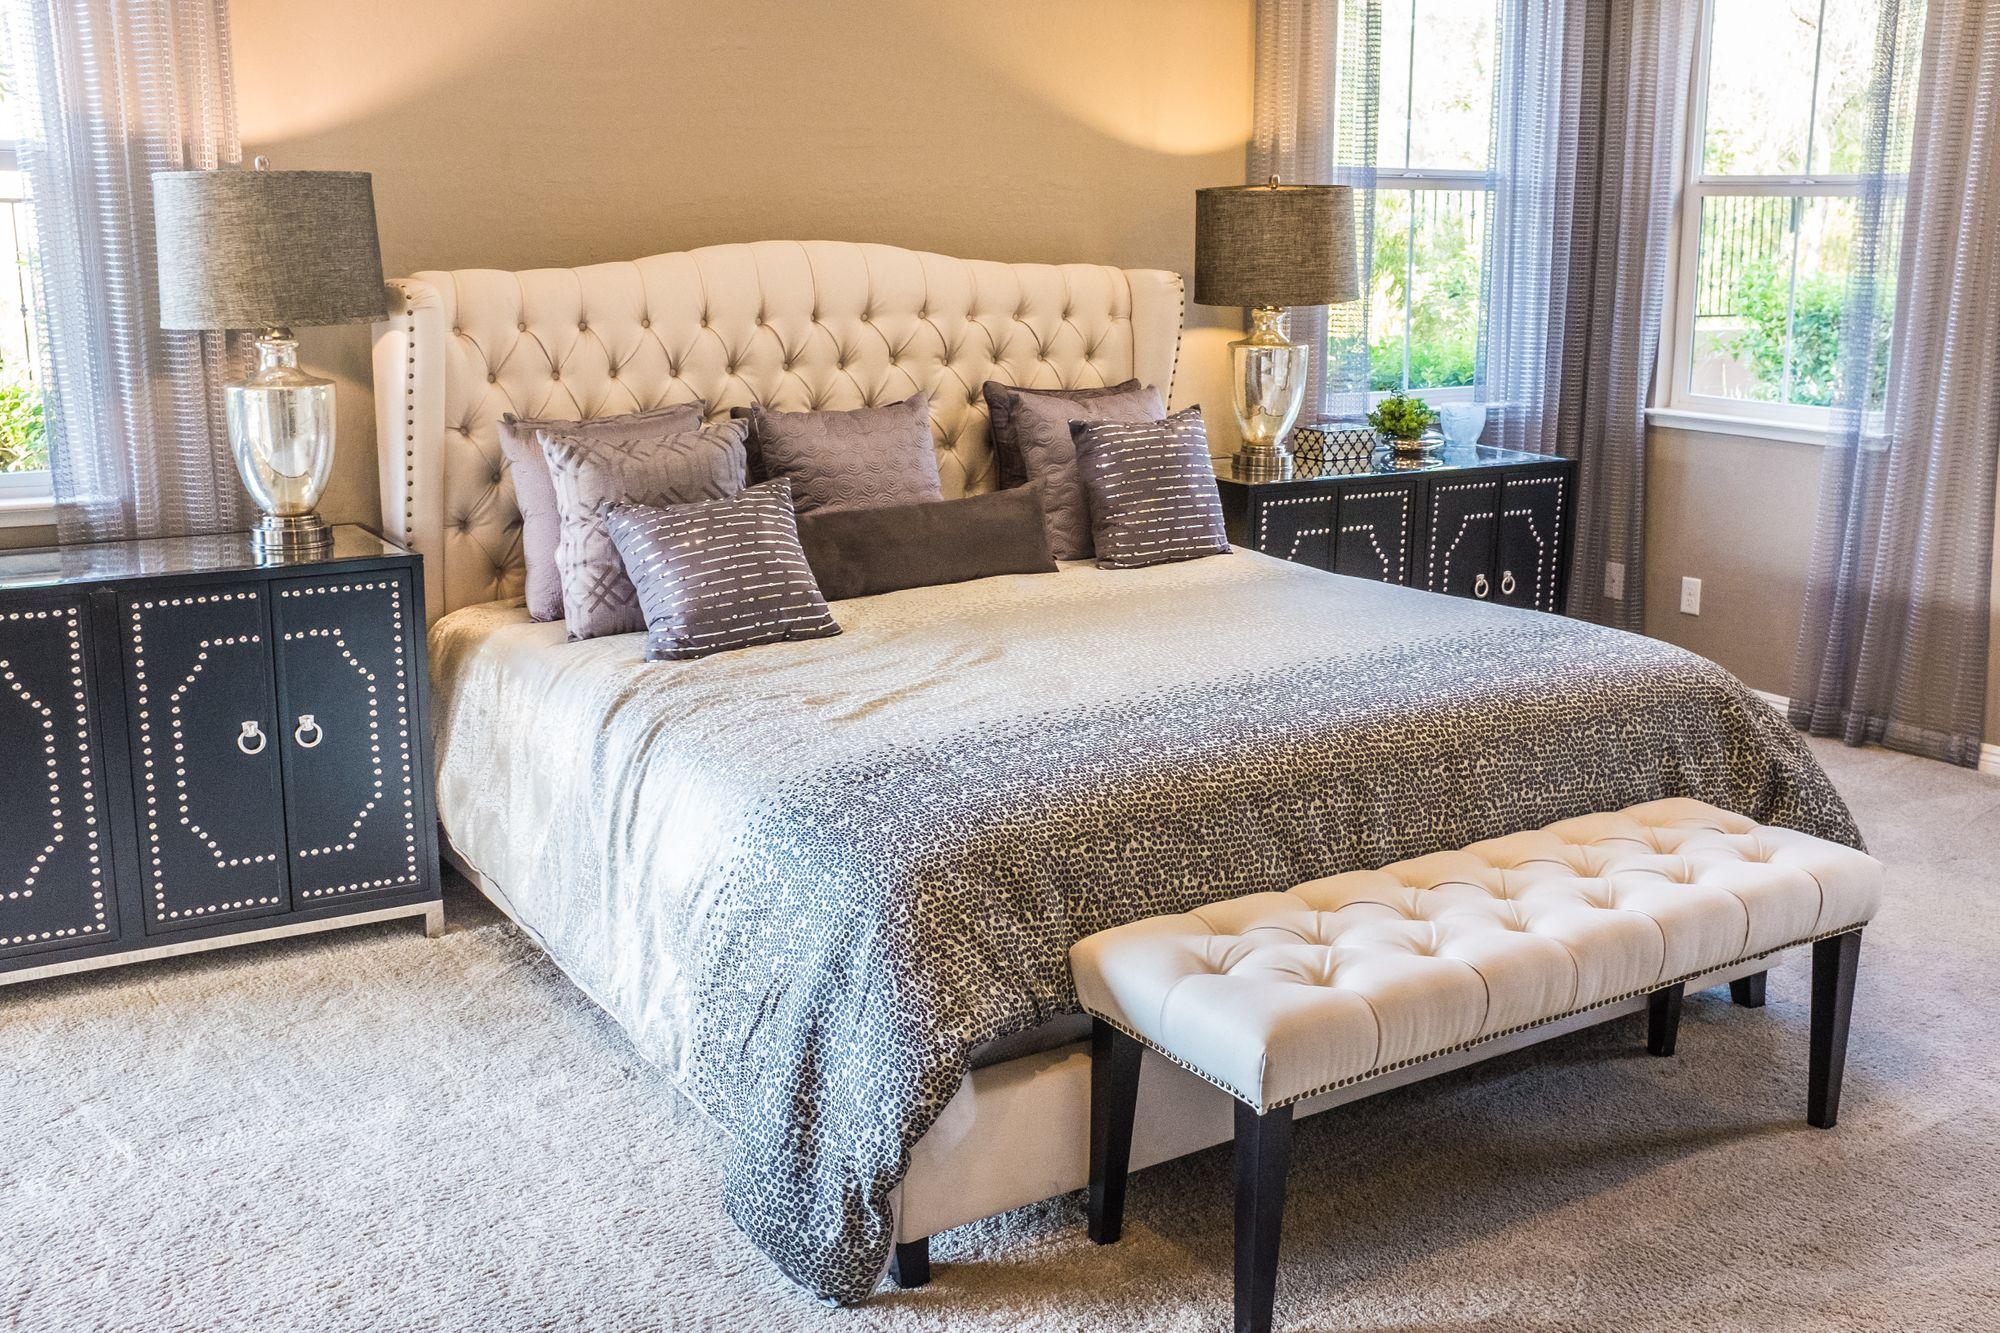 5 Cara Menata Tempat Tidur ala Hotel Berbintang yang Super Nyaman